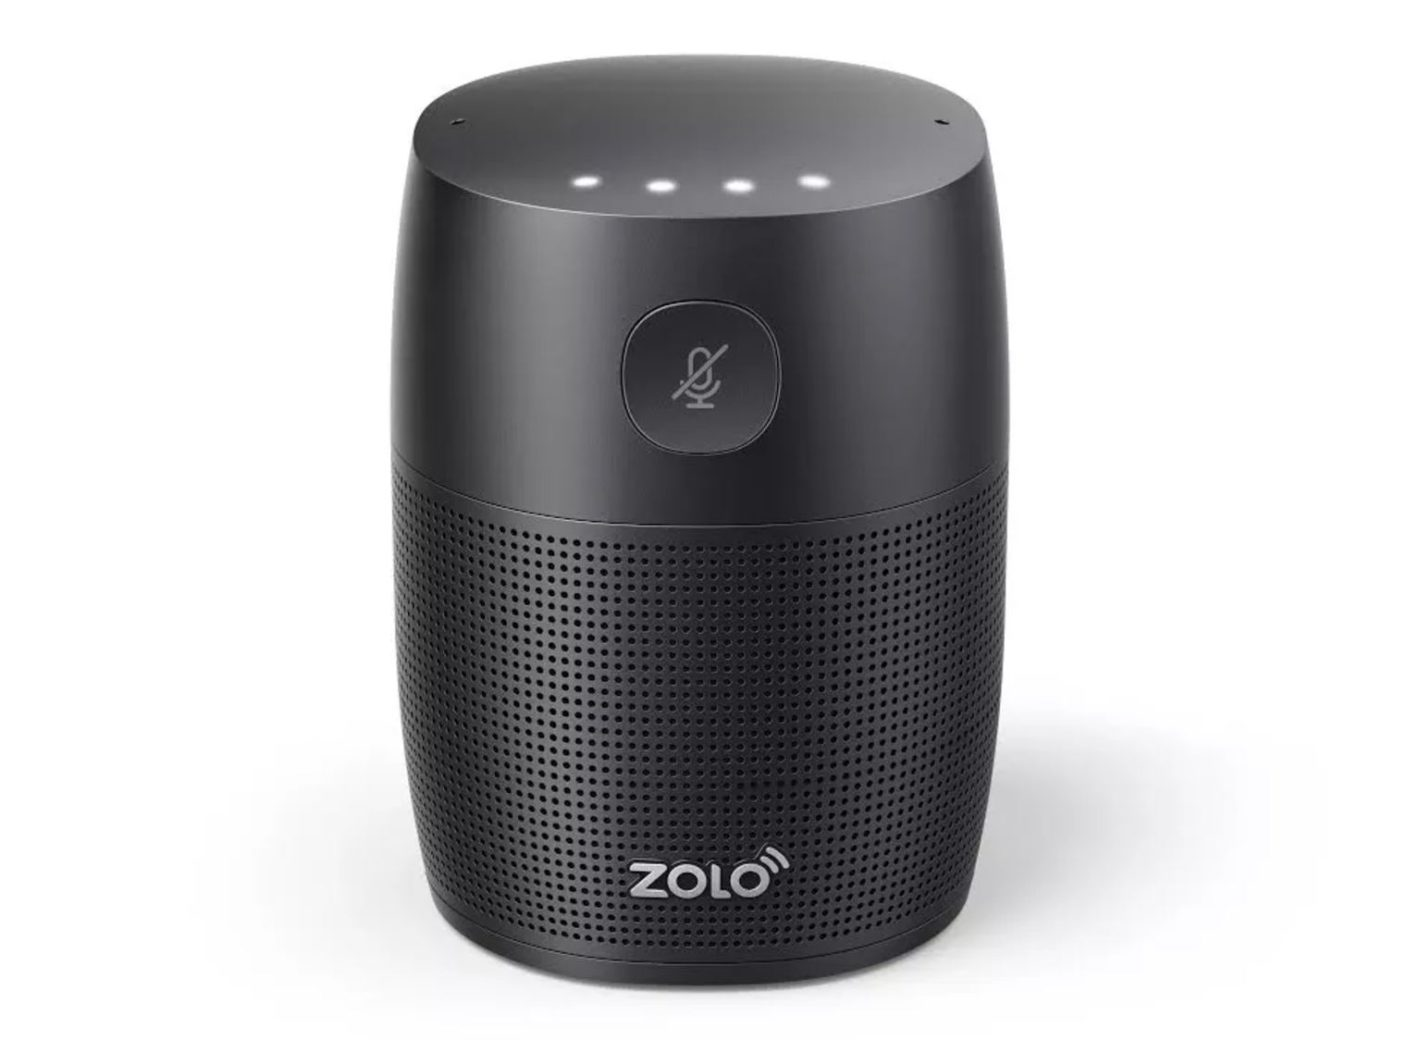 Anker: Zolo Mojo Google Assistant Lautsprecher Preisbrecher